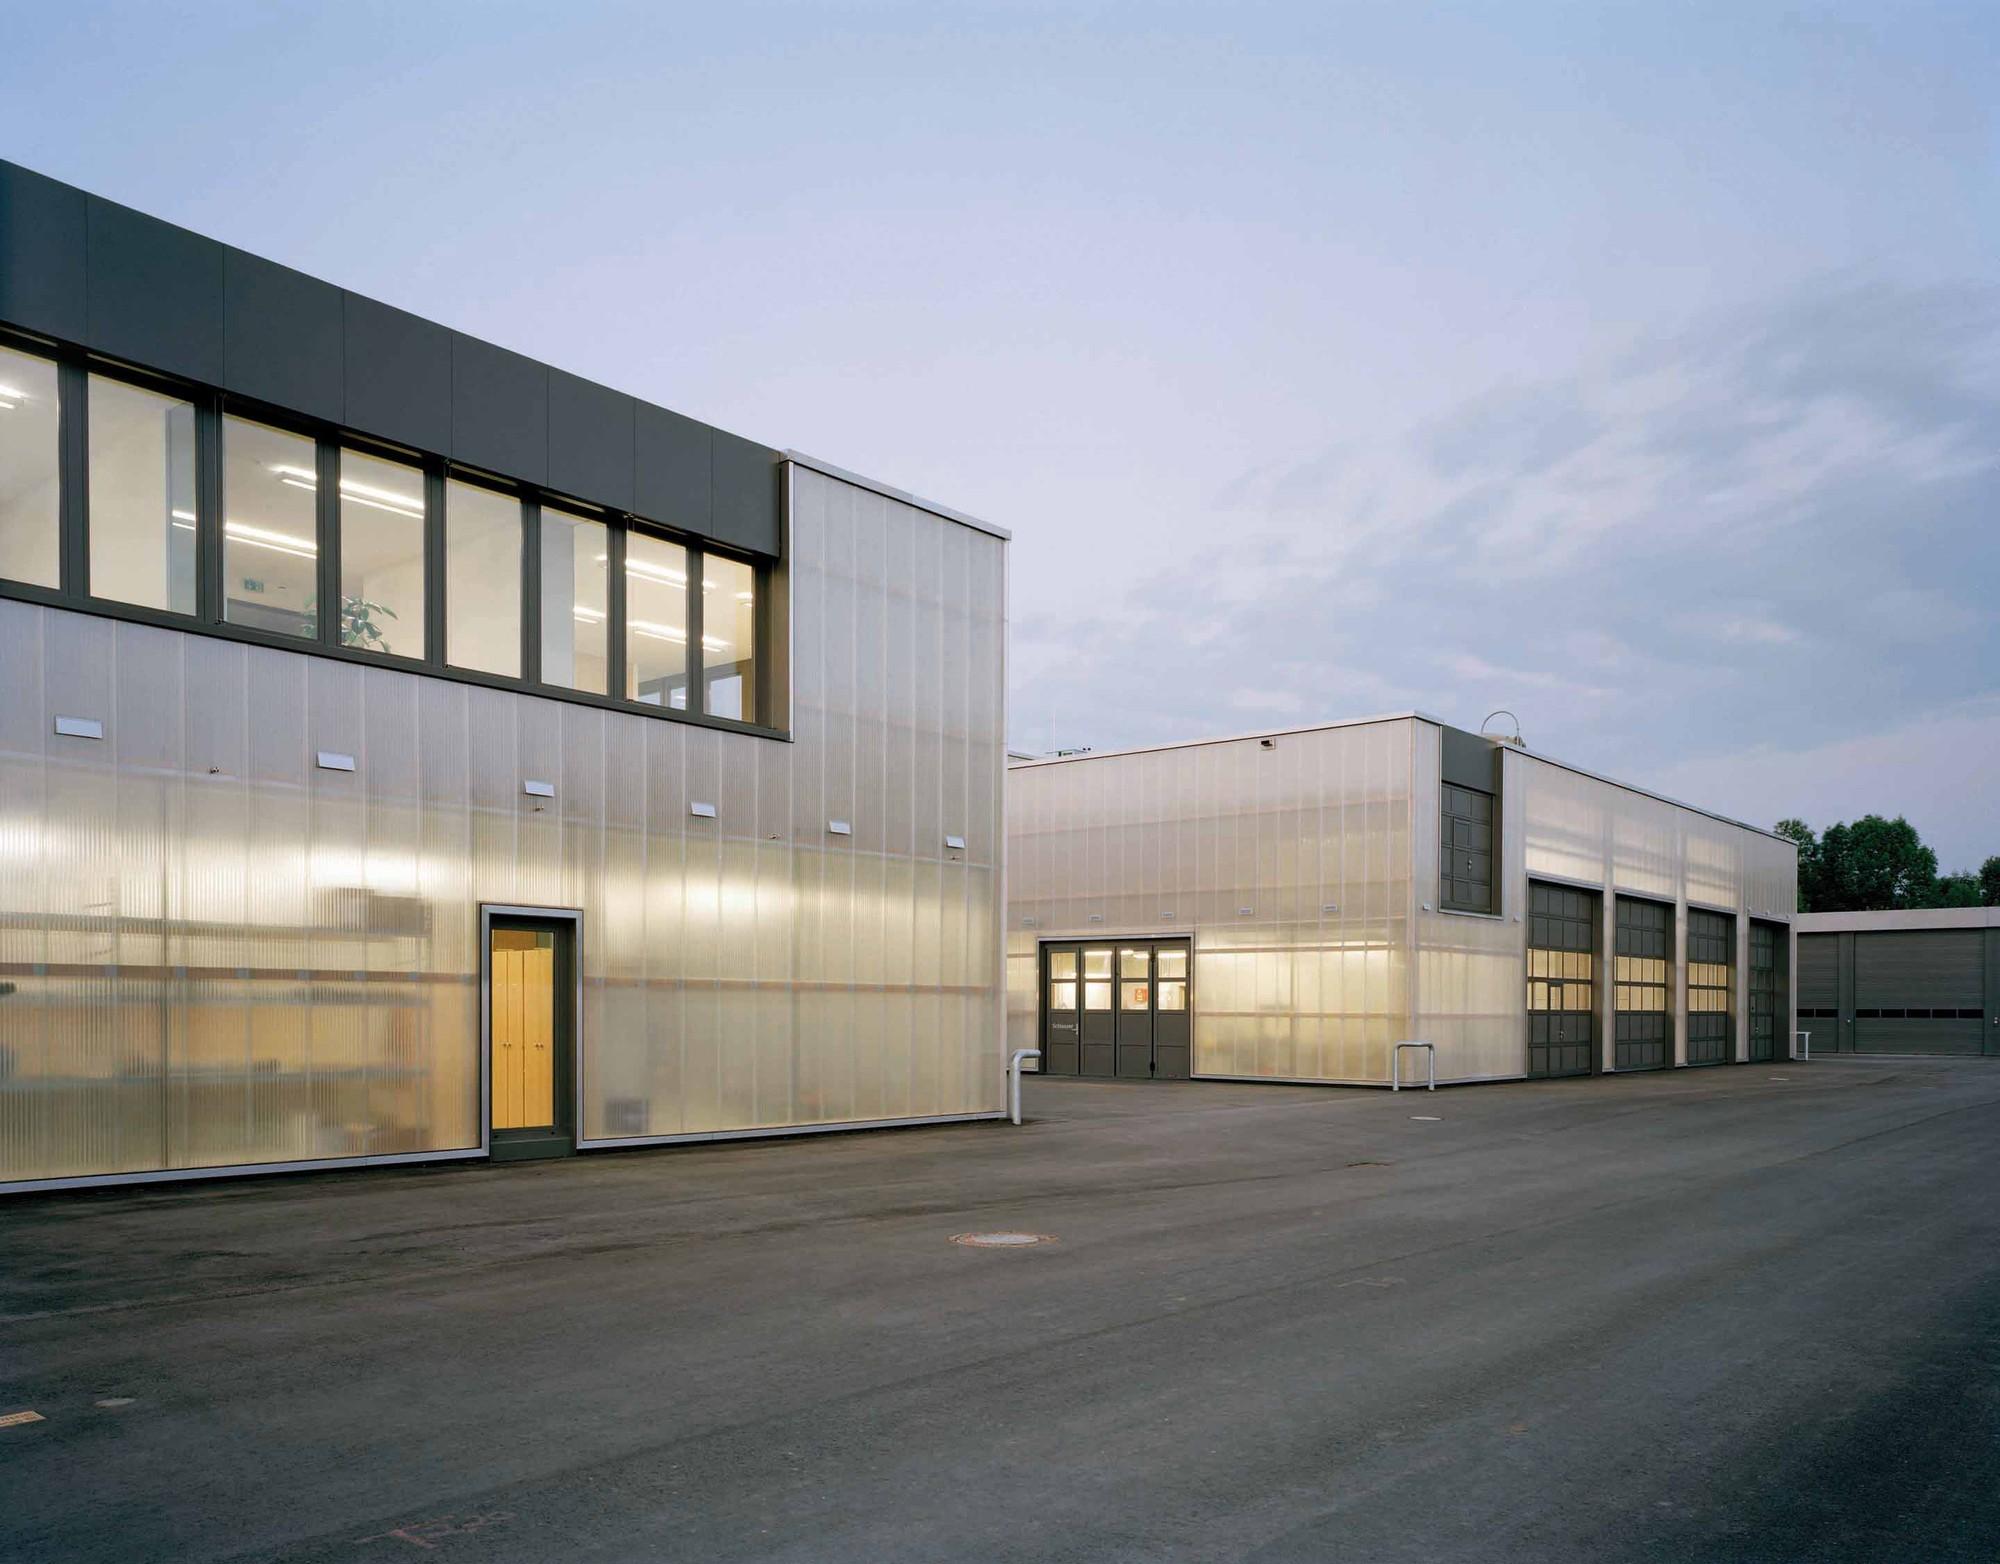 gallery of maintenance facility allmann sattler wappner architekten 3. Black Bedroom Furniture Sets. Home Design Ideas